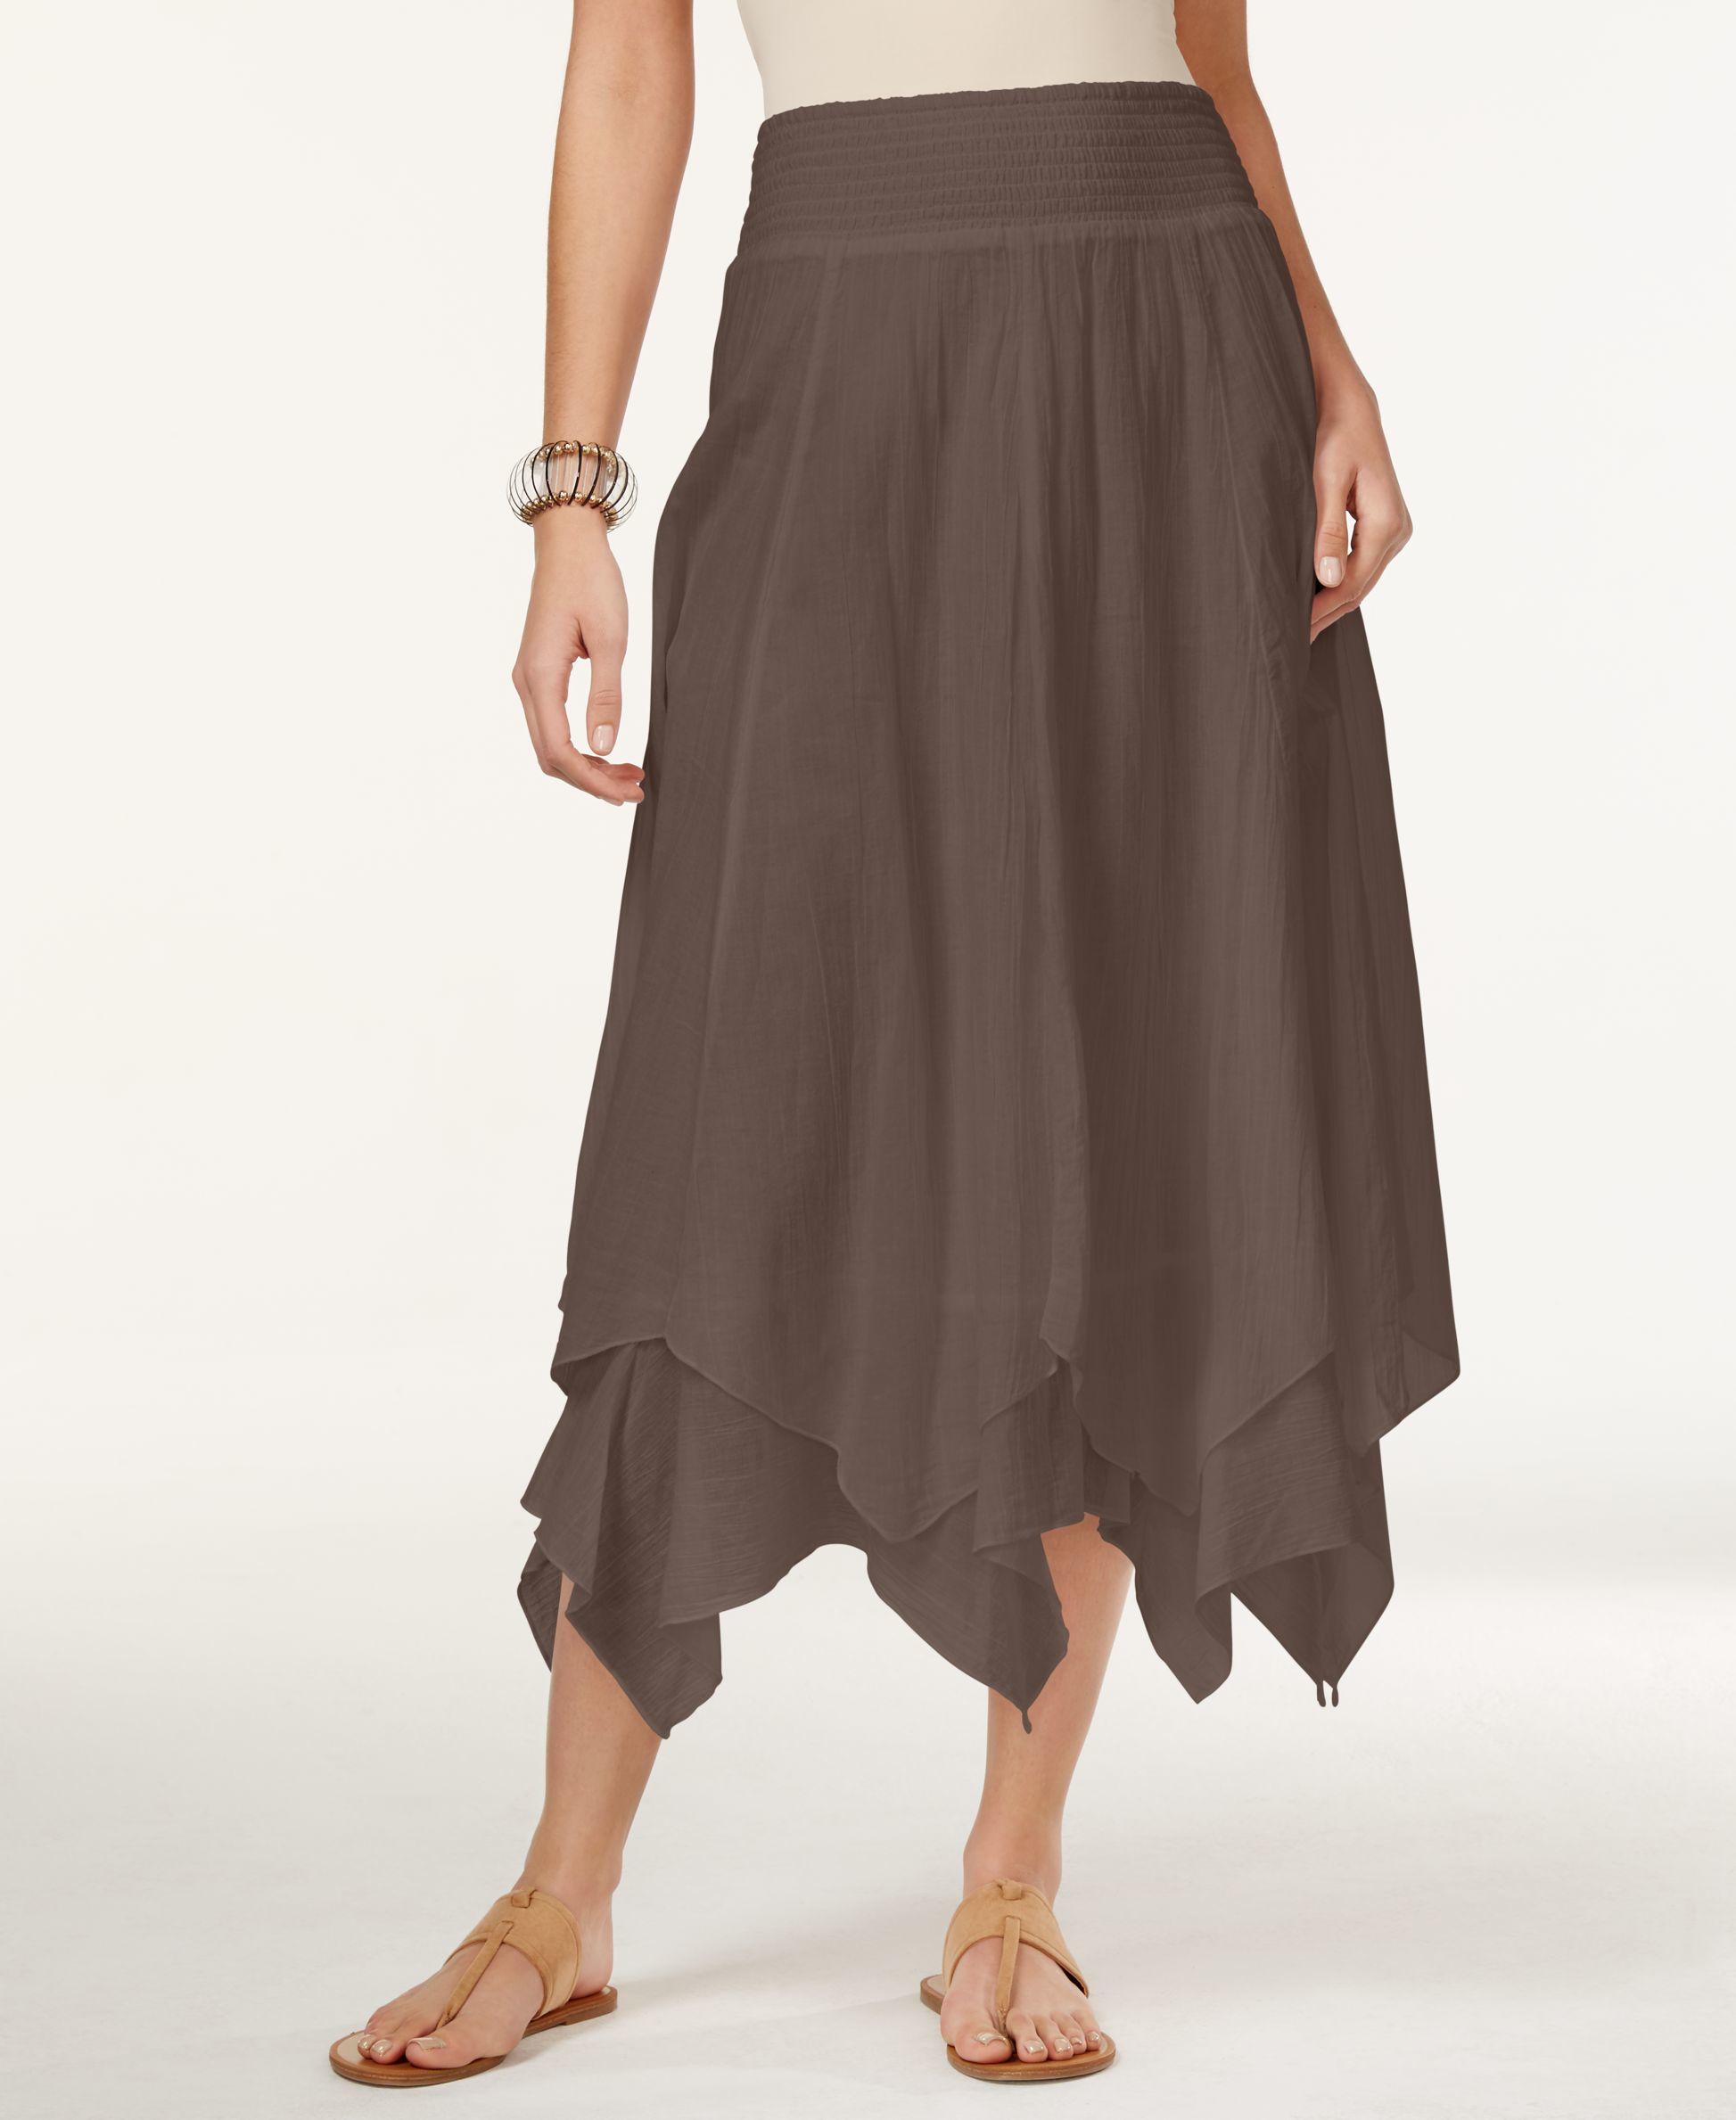 Style & Co. Petite Handkerchief-hem Skirt, Only At Macy's